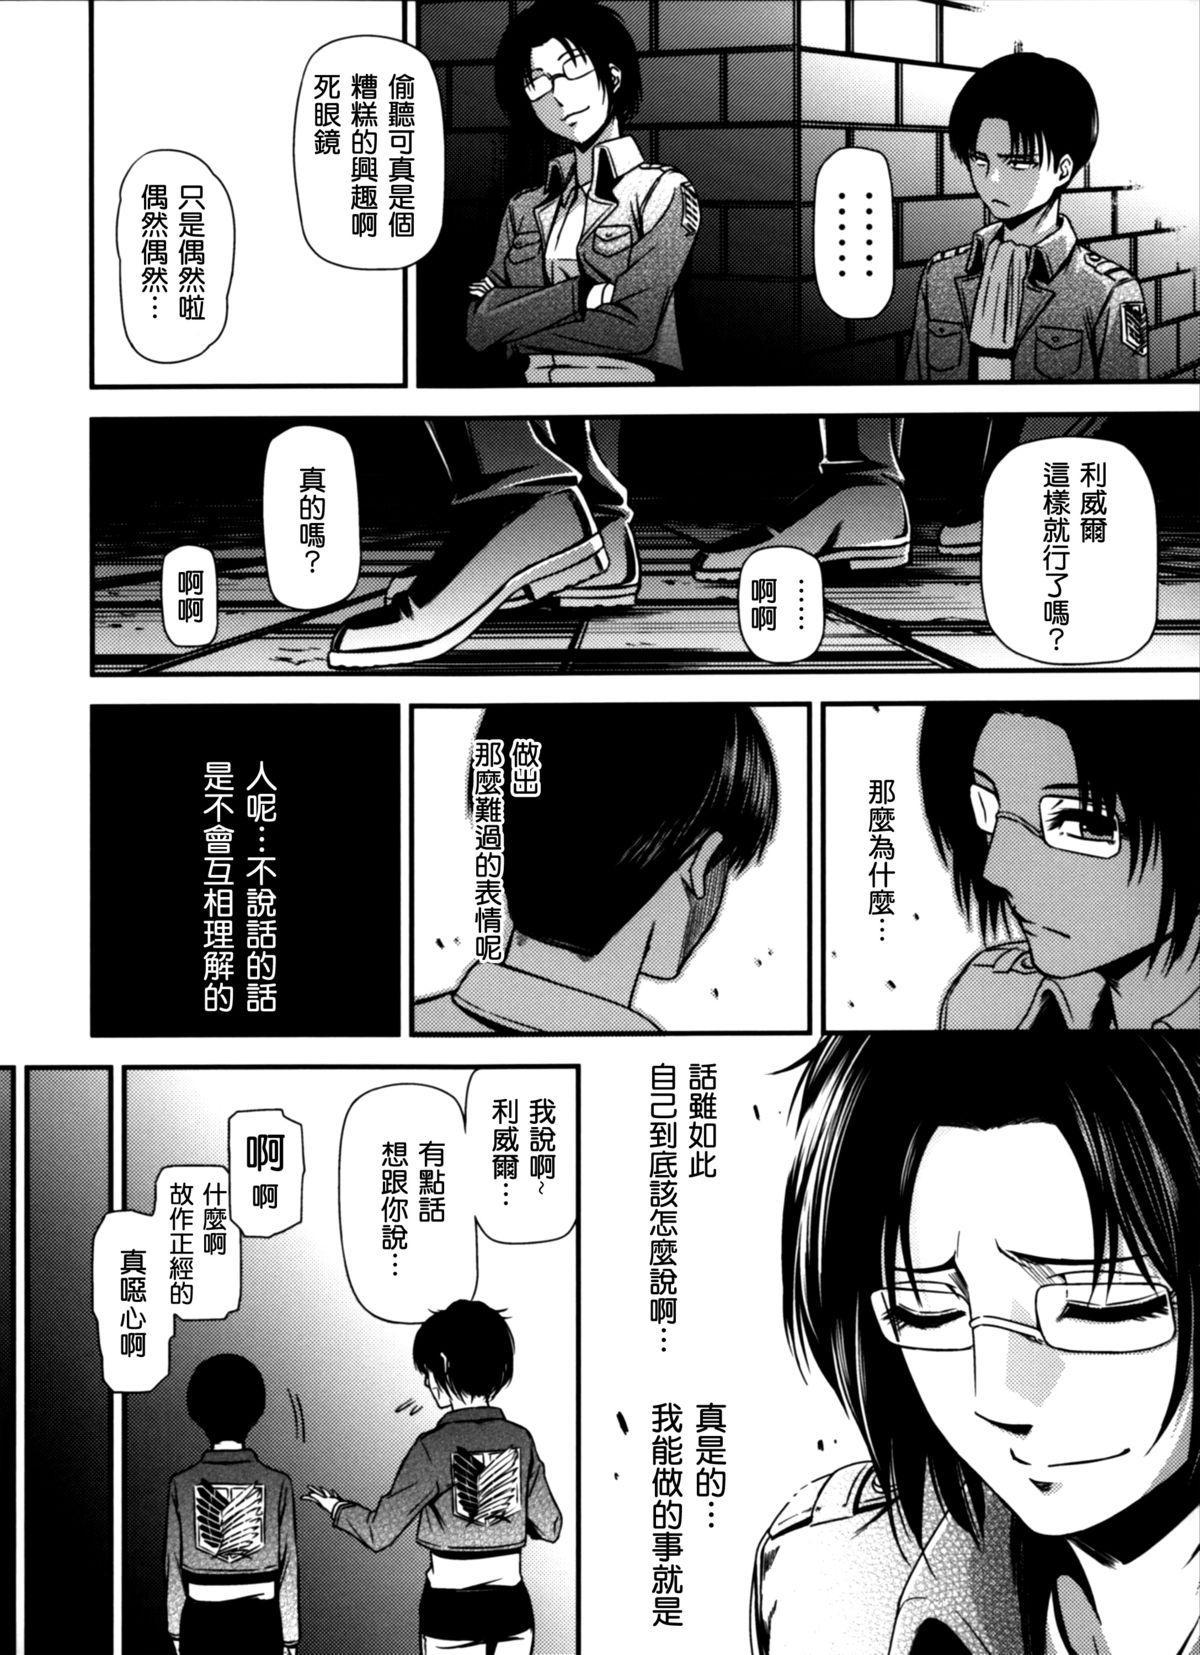 Gekishin Yon 42